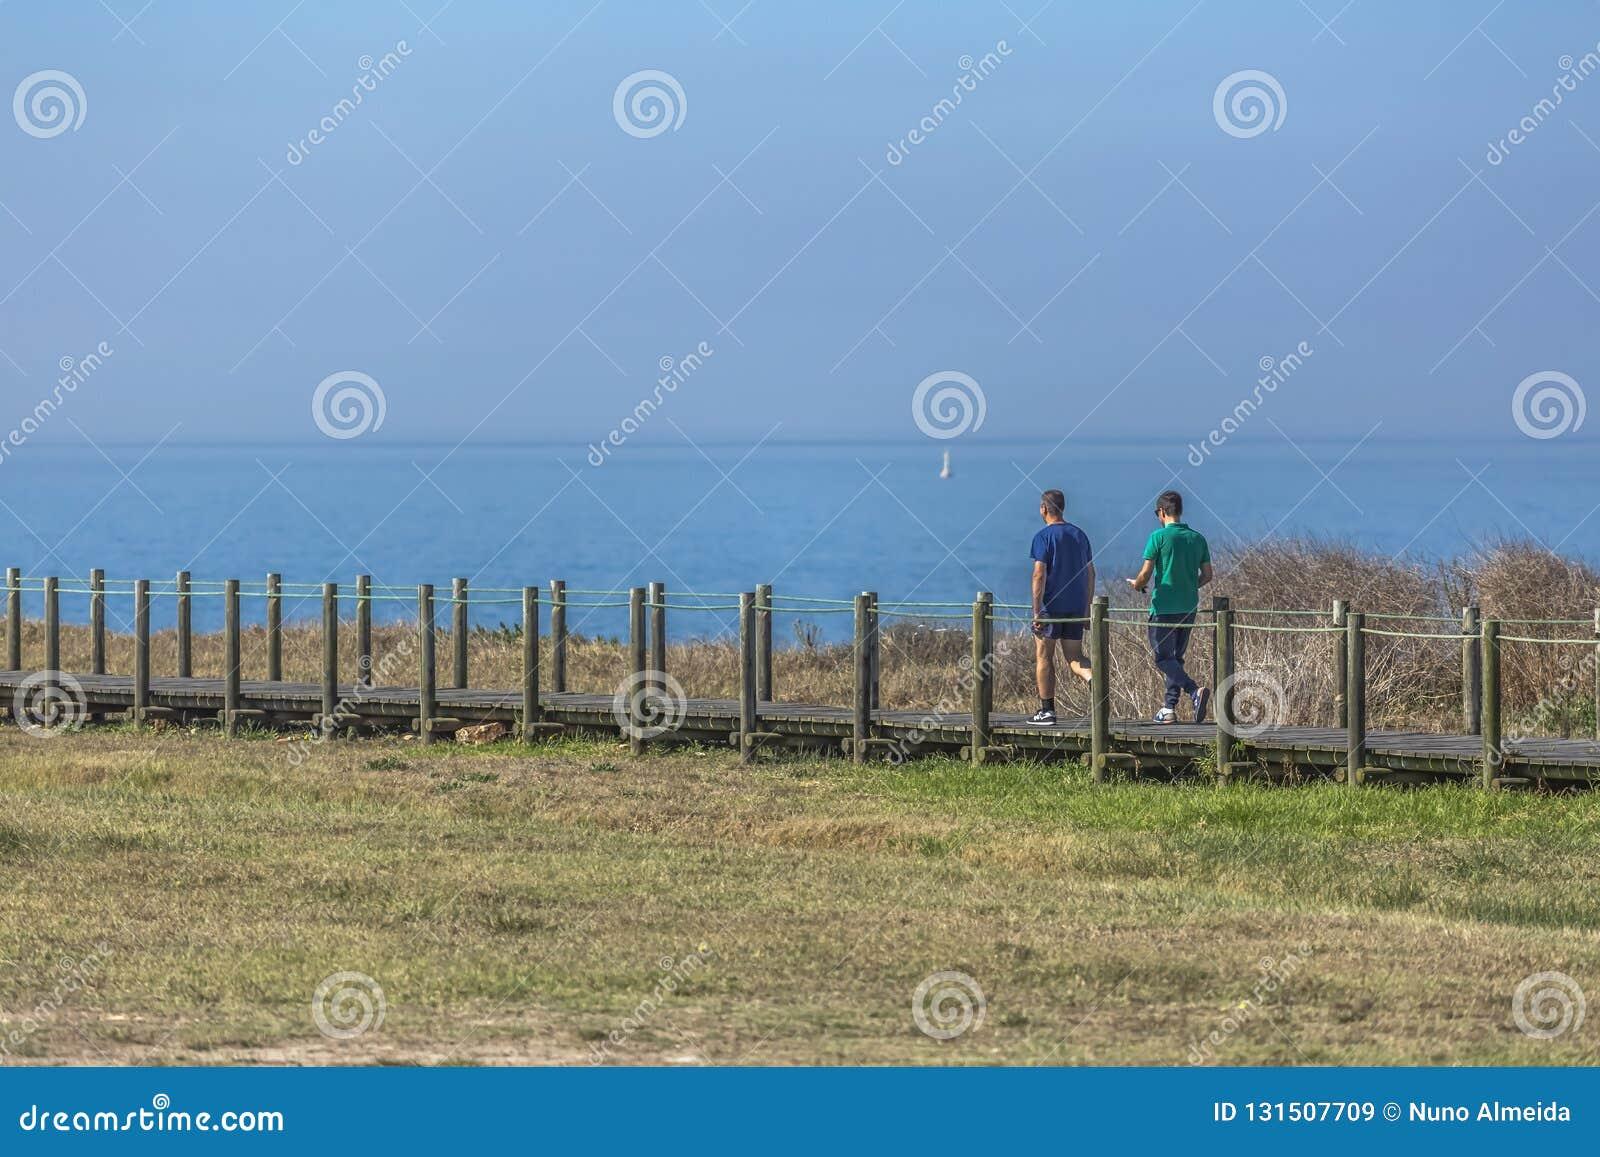 Leca da Palmeira/Porto/Portugal - 10 04 2018: Back view of two men, walking and talking on the eco pedestrian path, near the sea,